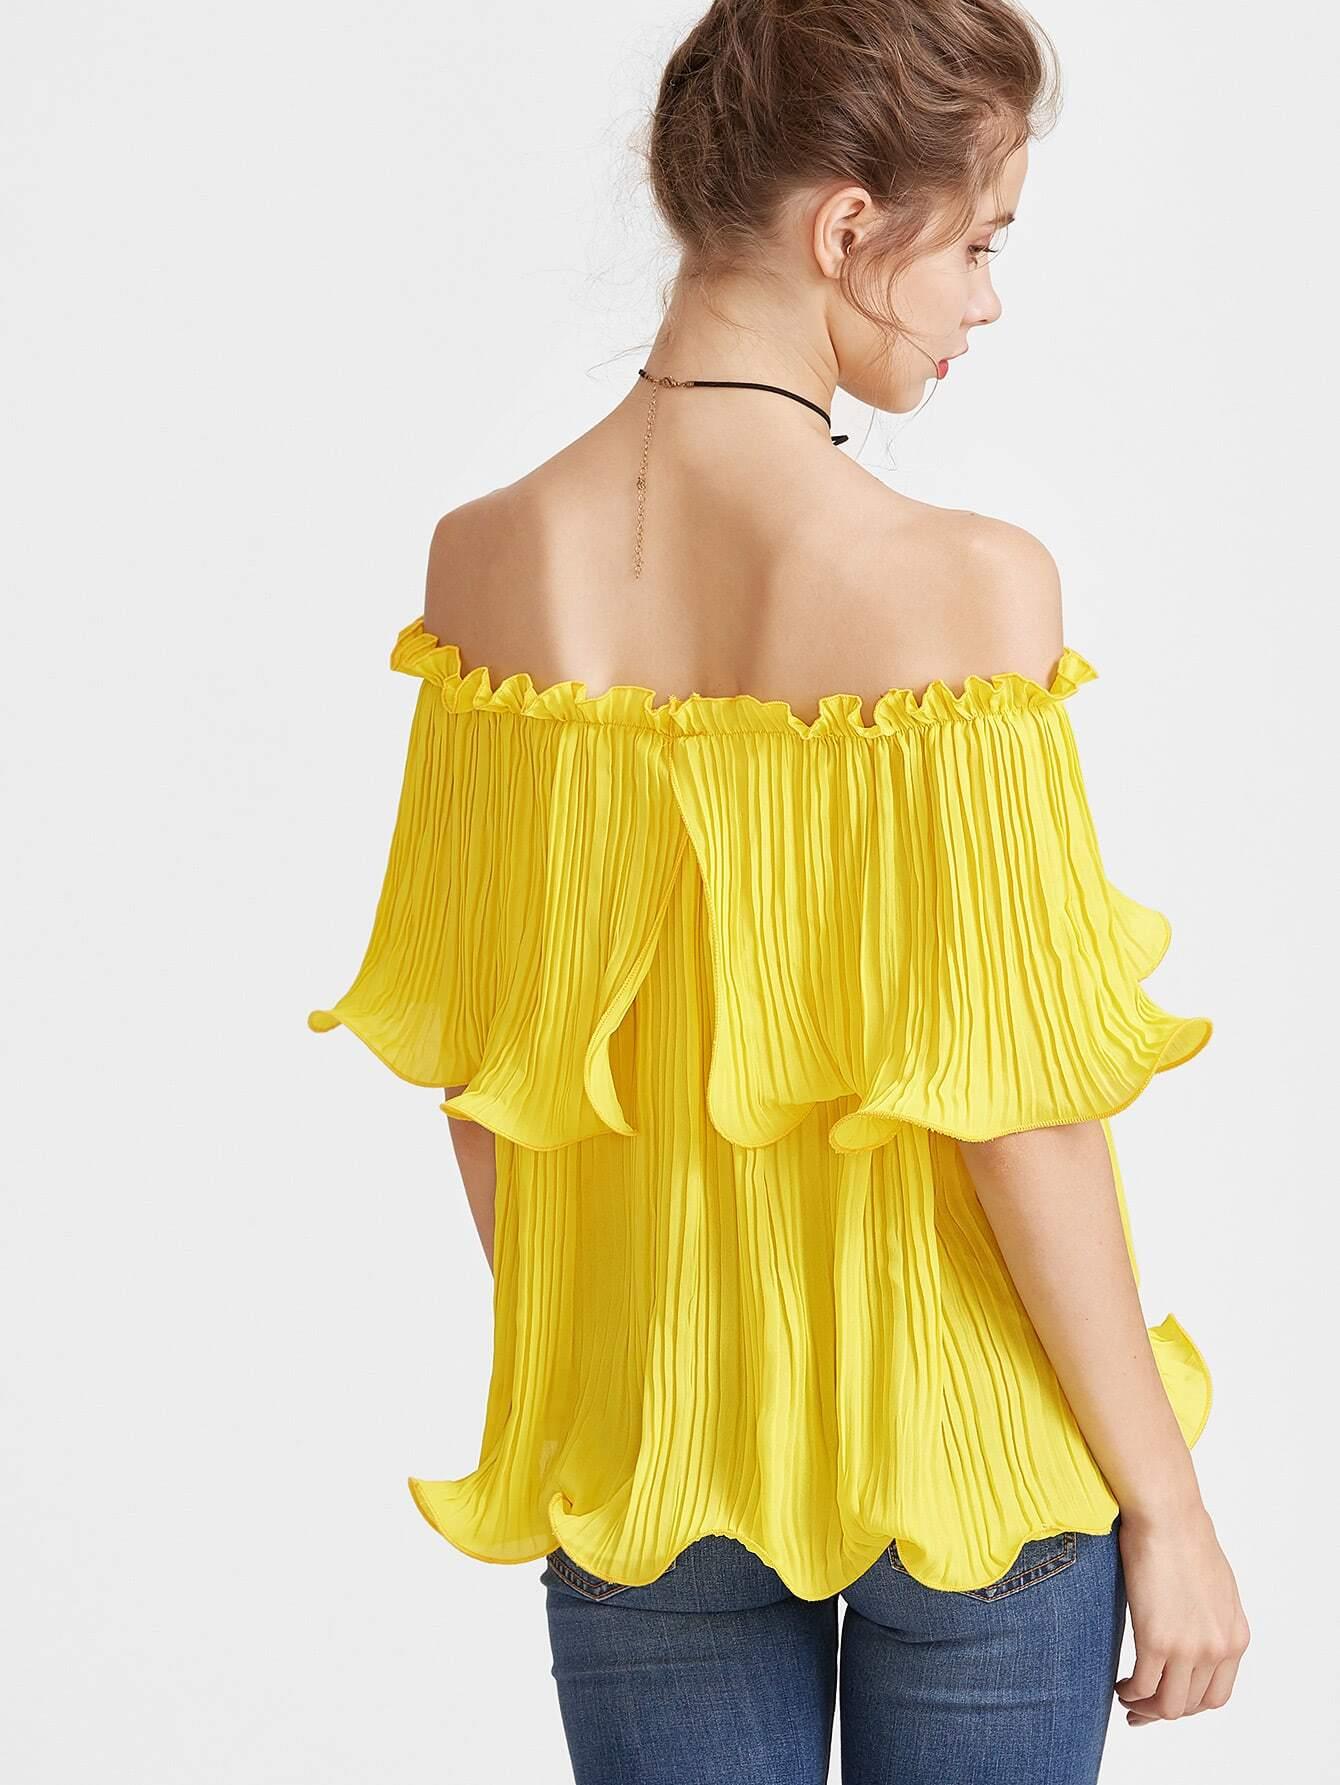 blouse170301450_2